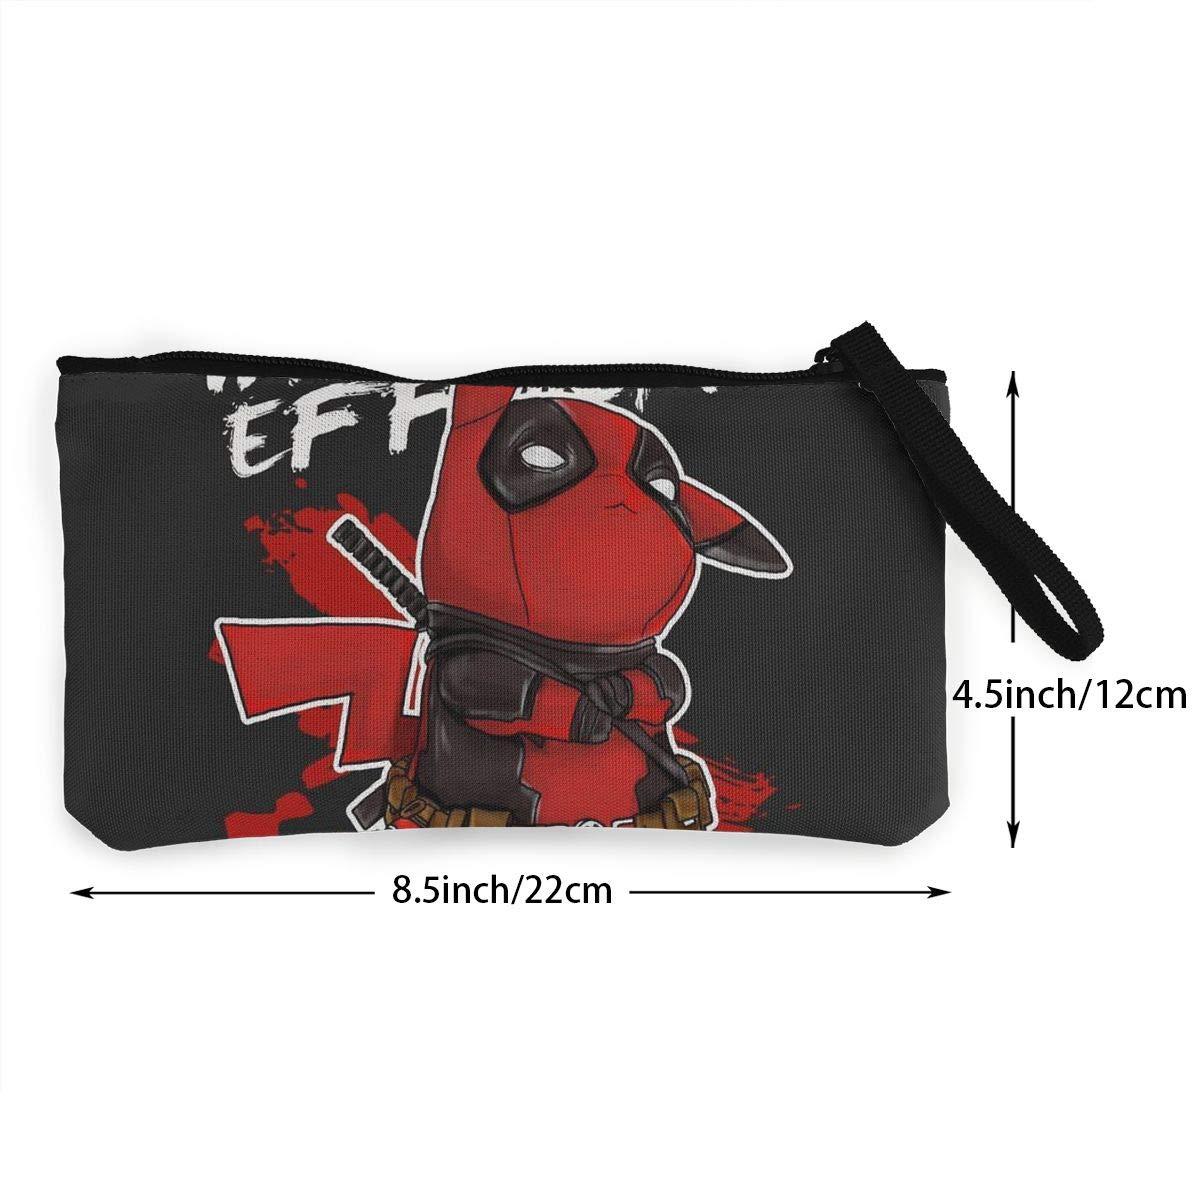 Dead-pool Pika/_chu Zipper Coin Purse Canvas Wallet Bag Change Purse Pouch Key Holder With Strap